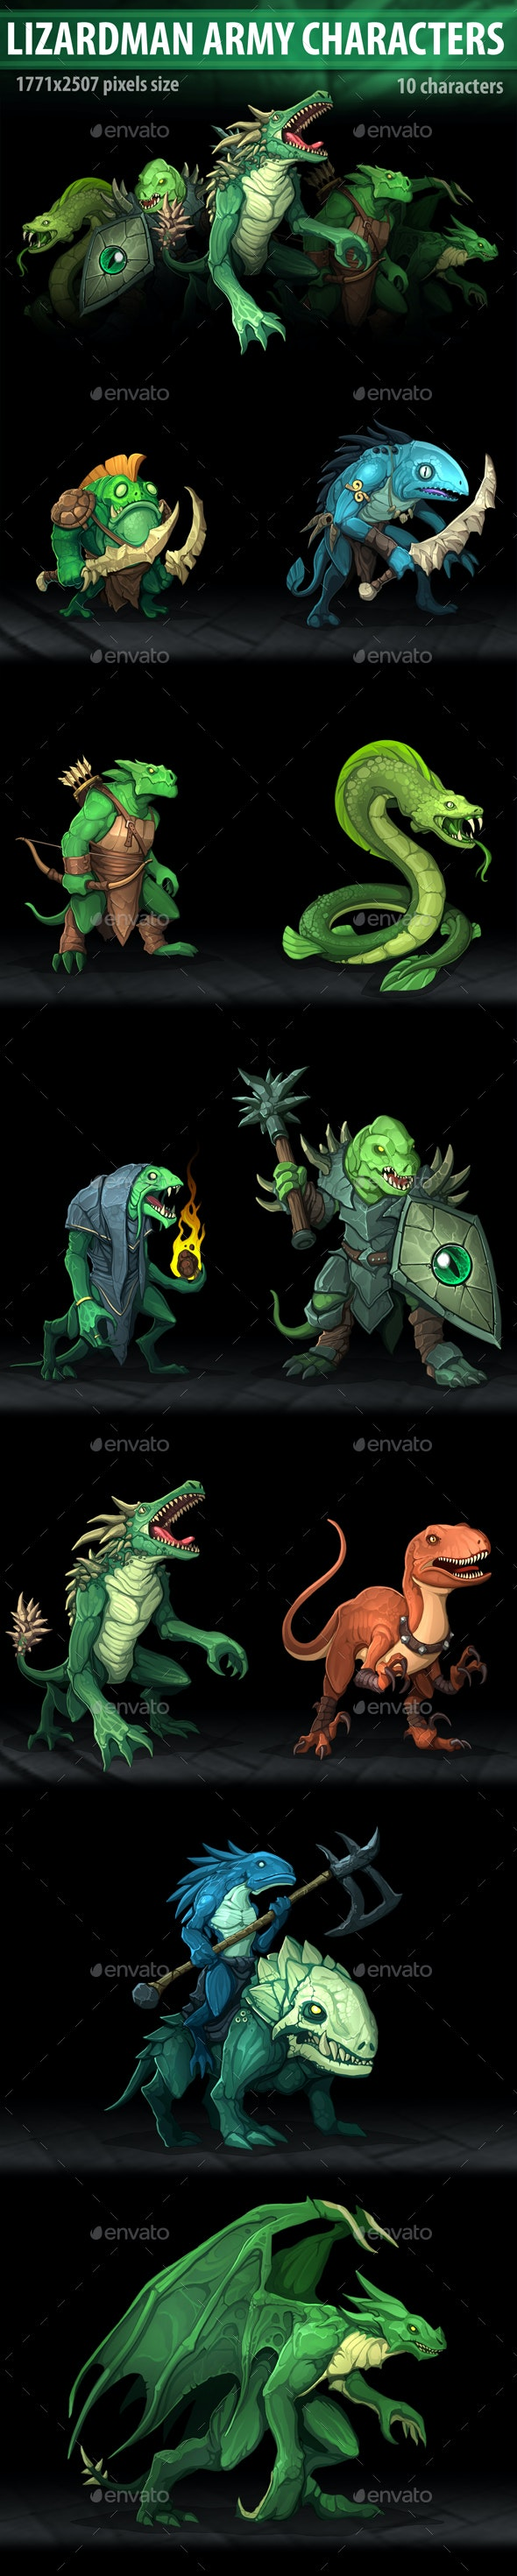 Lizardman Army Characters